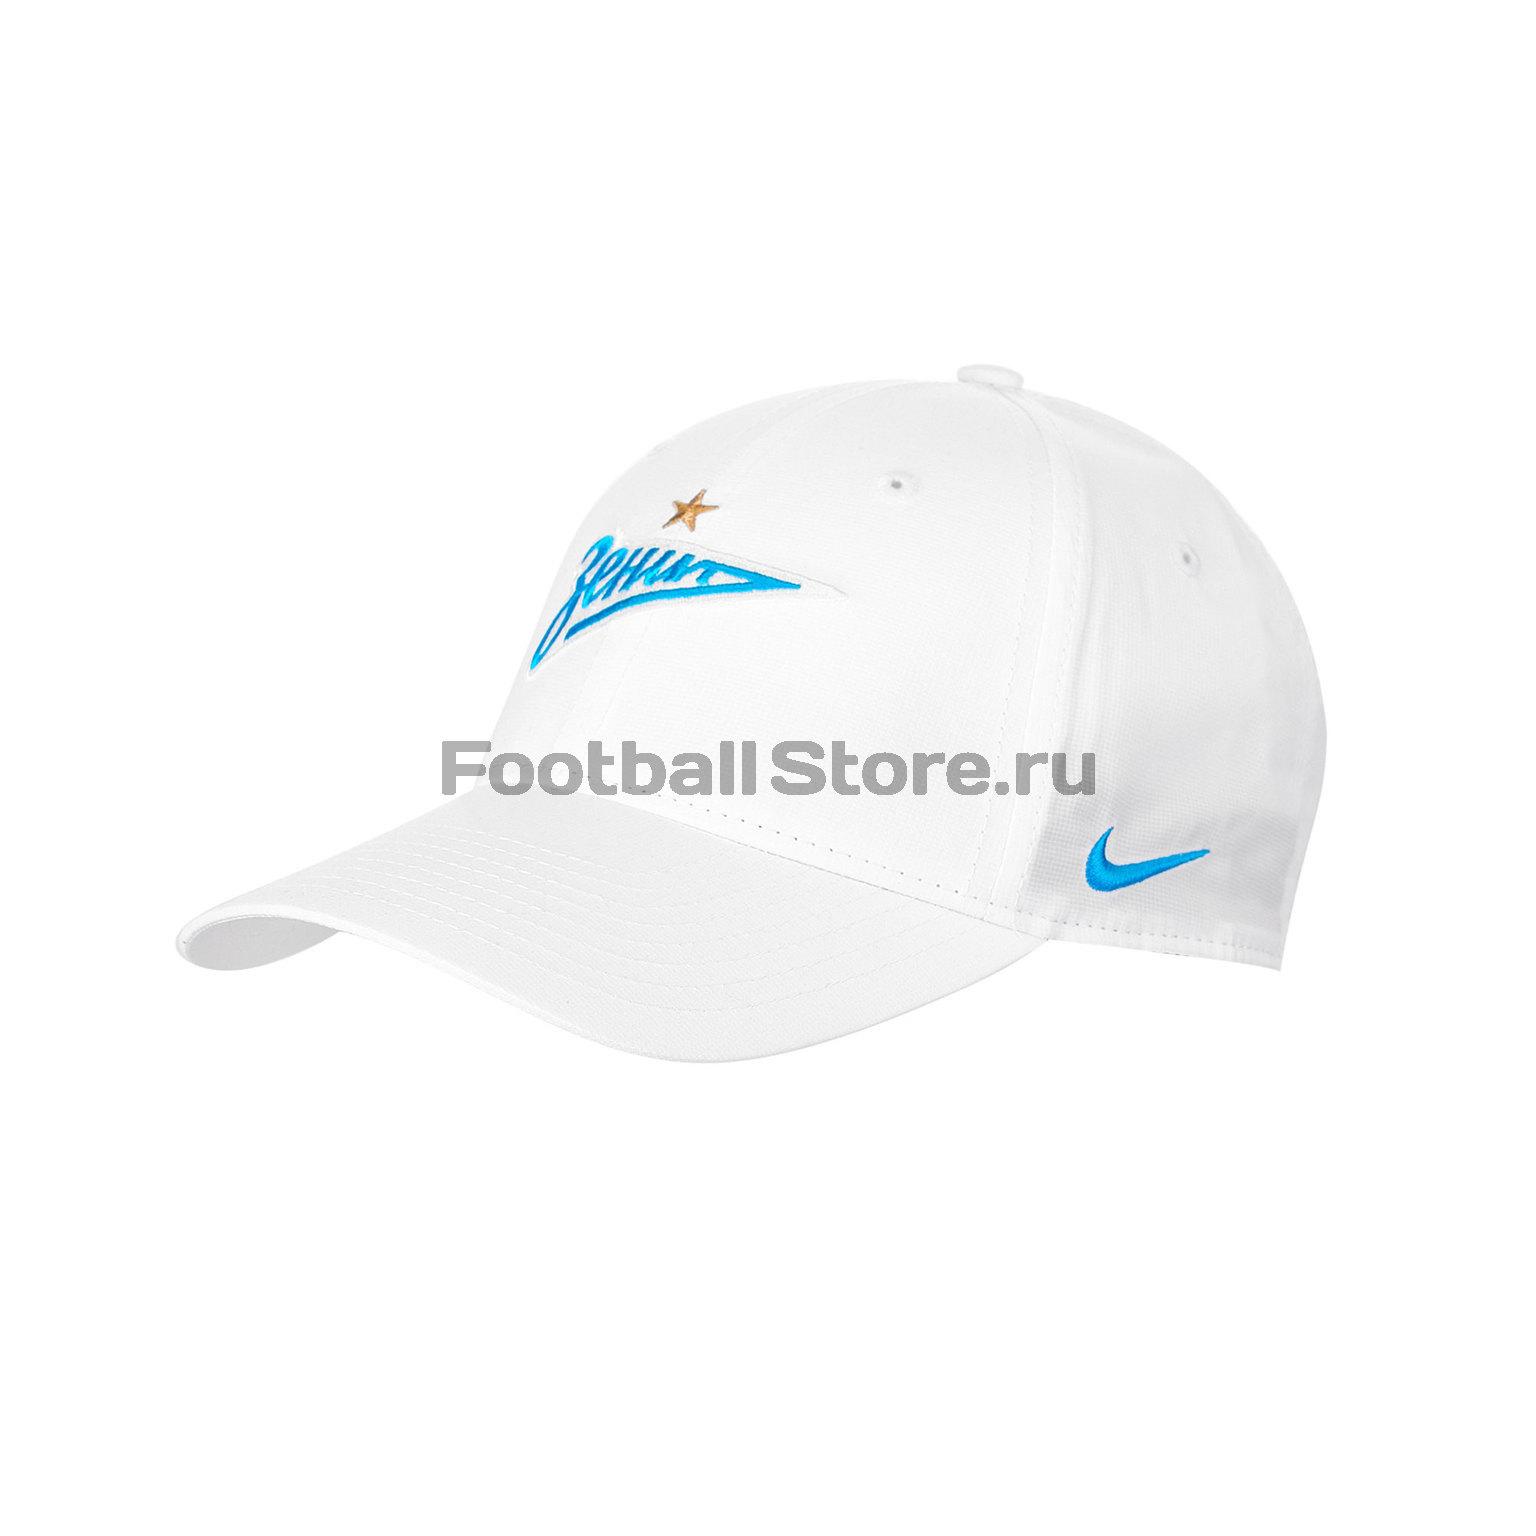 Бейсболка Nike Zenit BV6431-100